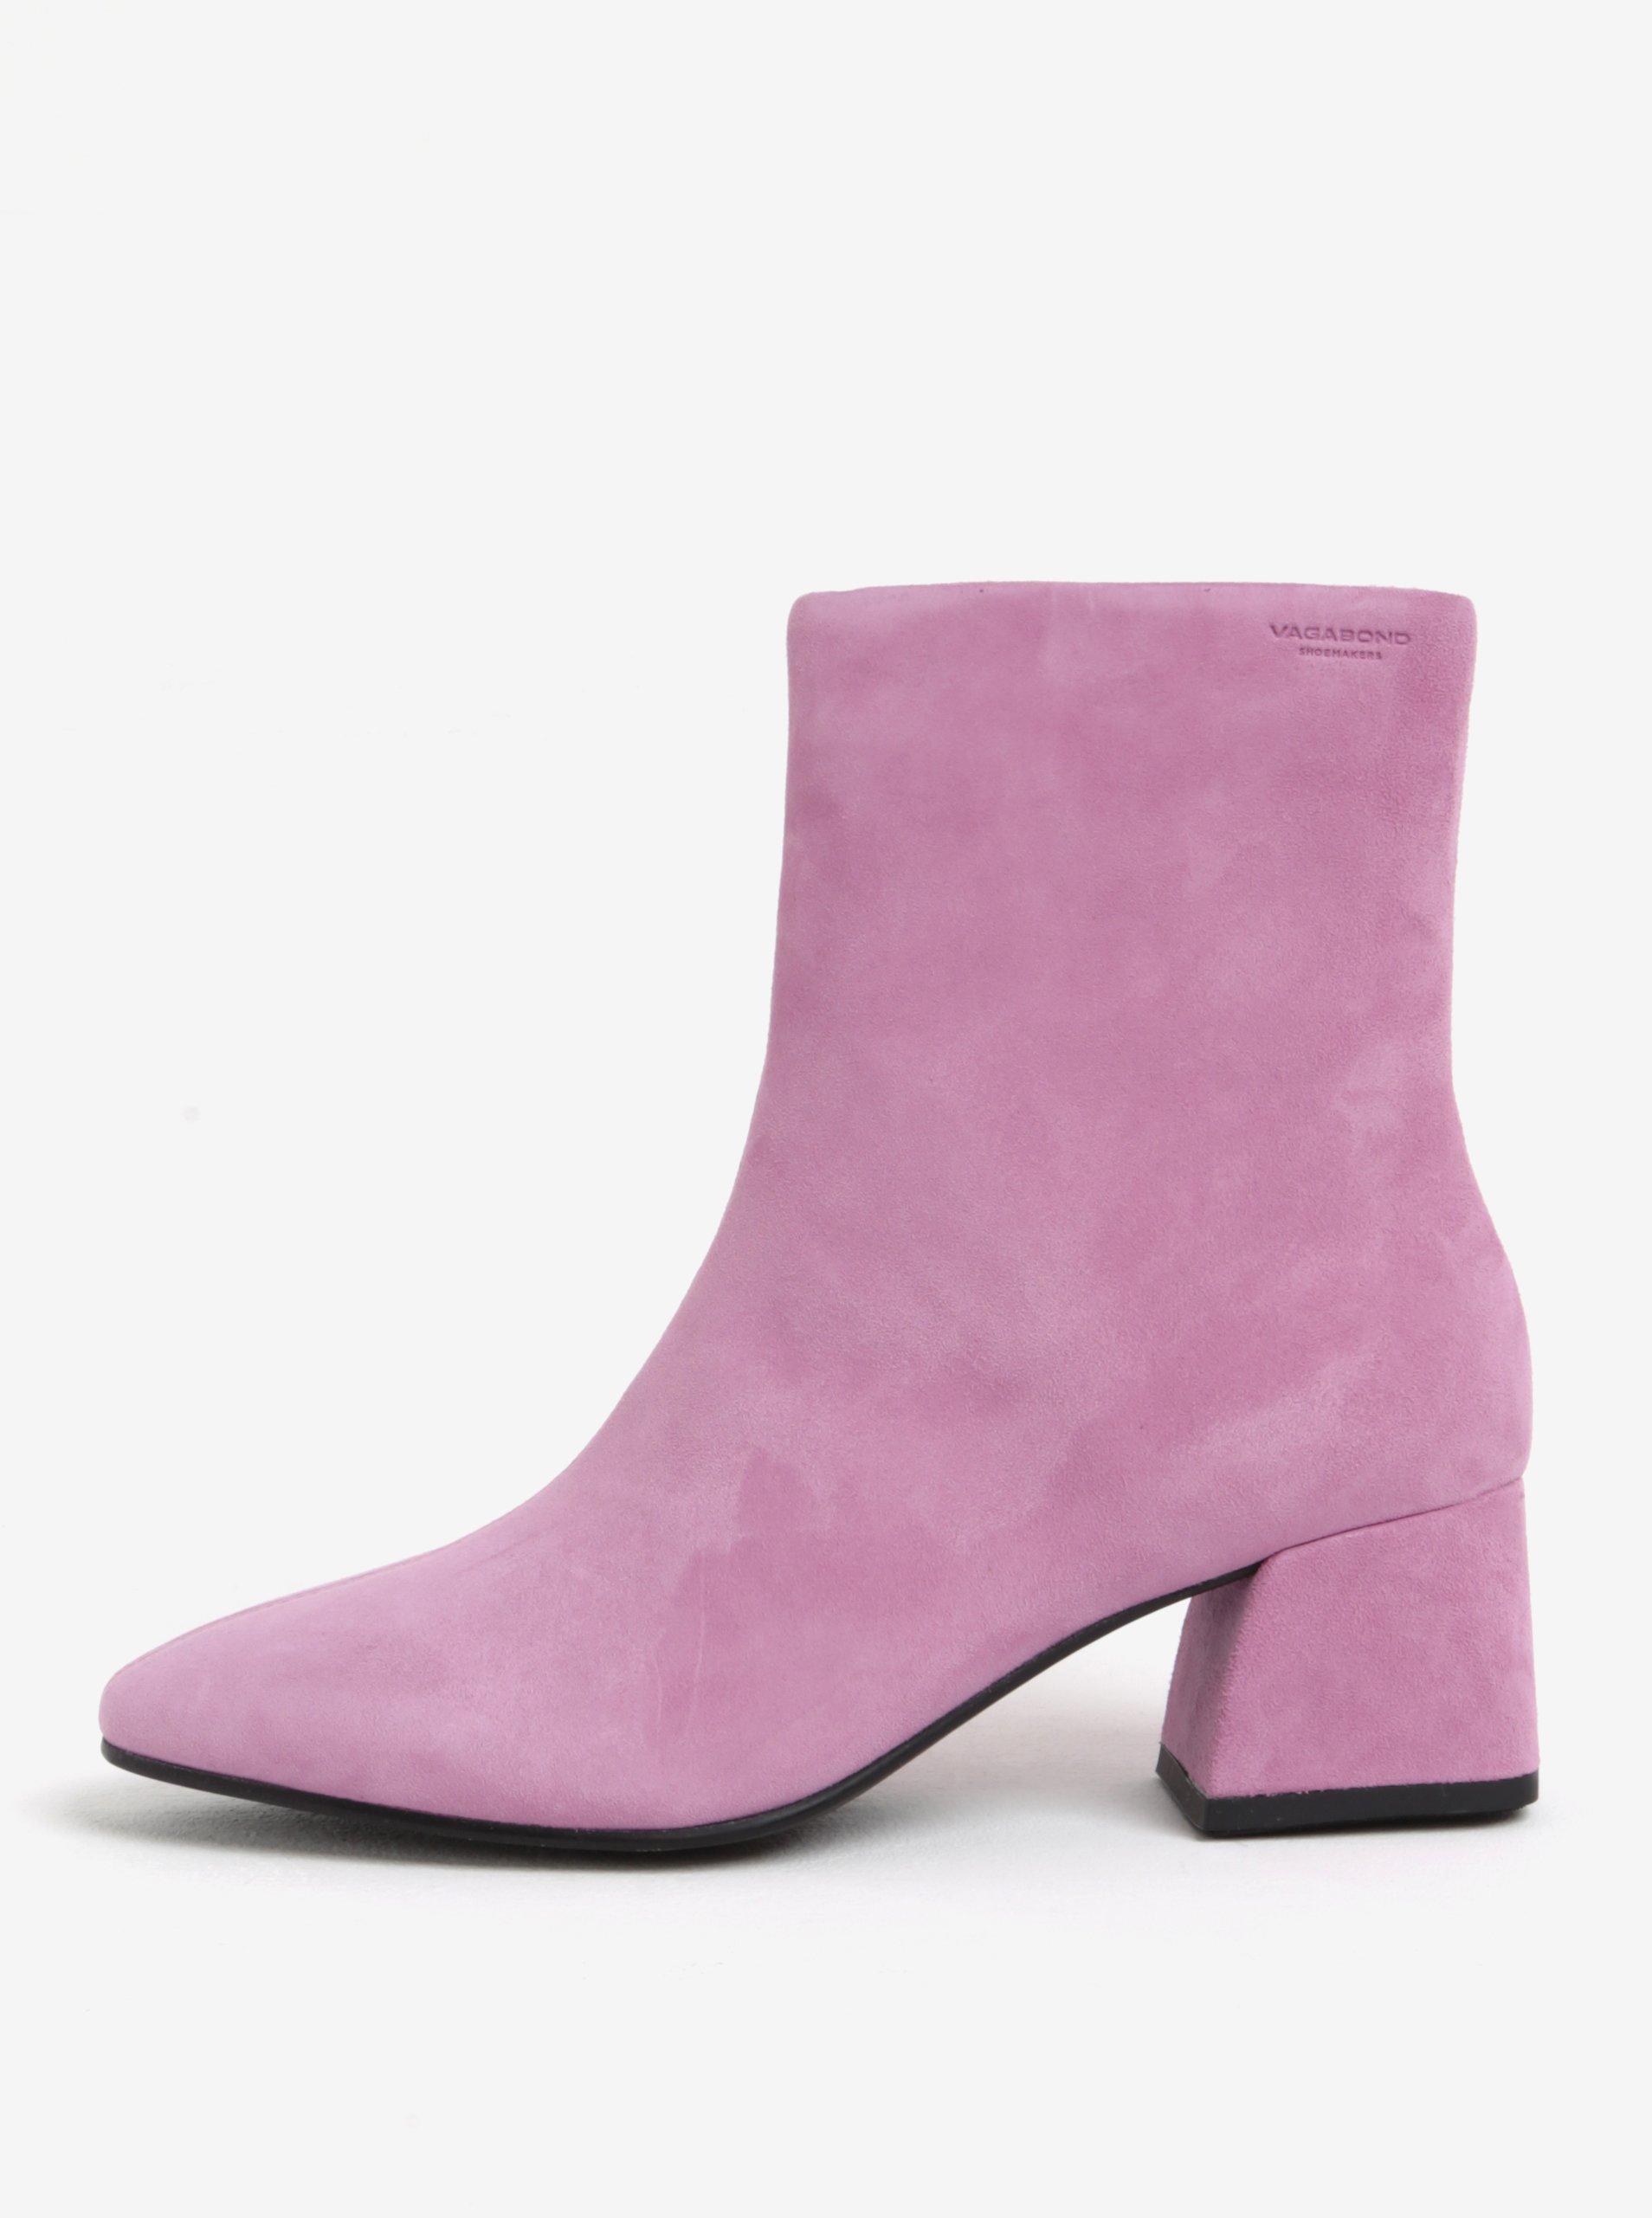 Ružové dámske semišové členkové topánky na podpätku Vagabond Alice 985d1e94c49